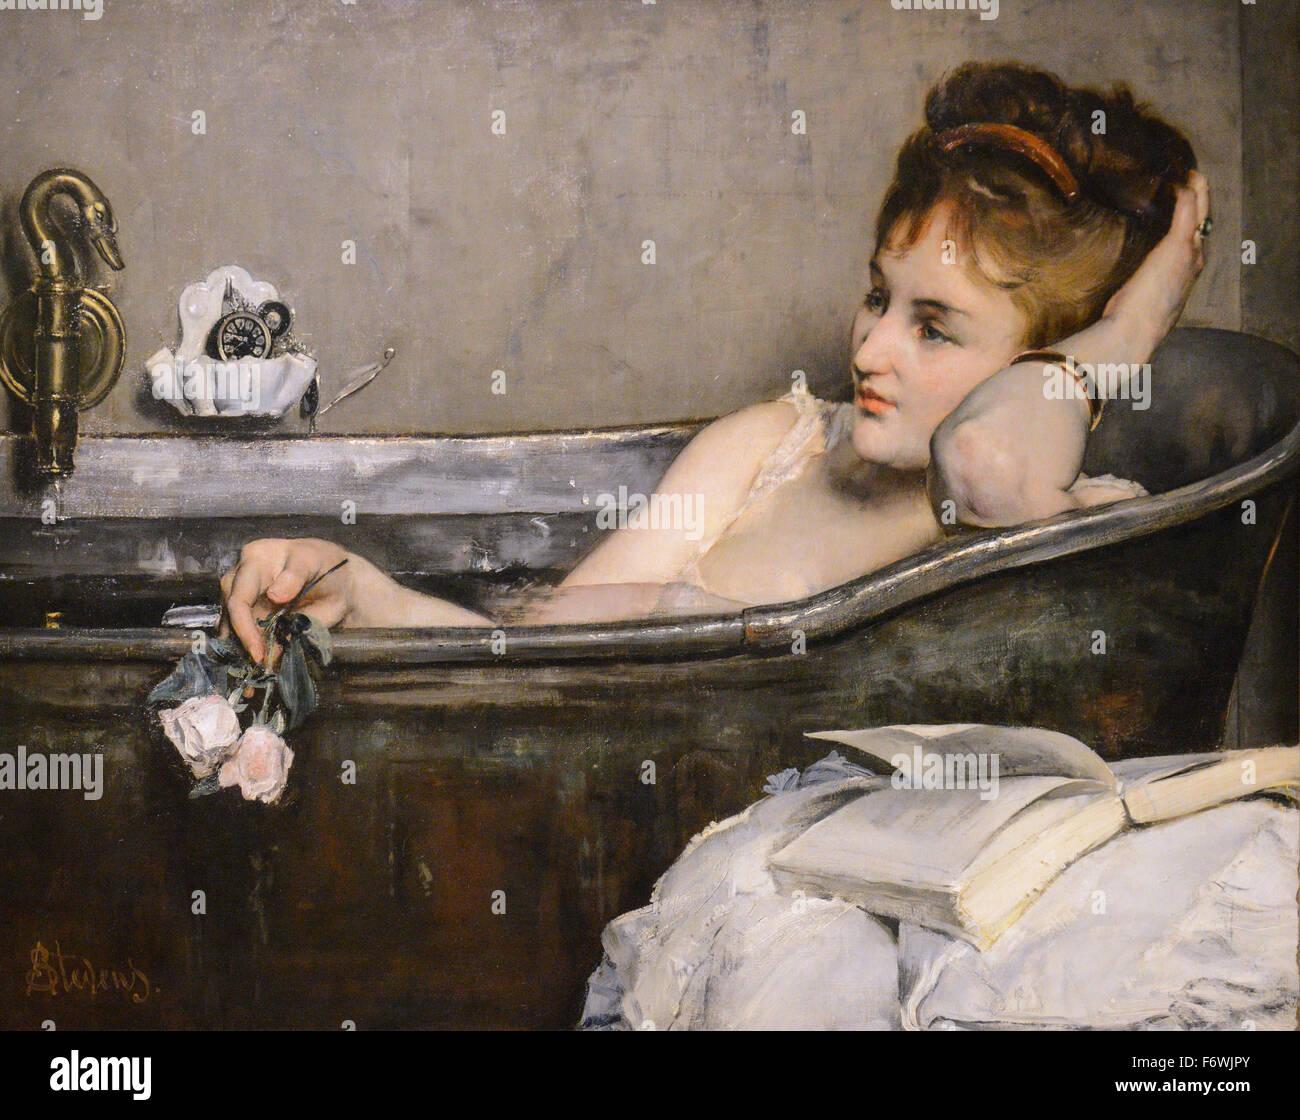 Alfred Stevens - Le Bain 1867 - Stock Image